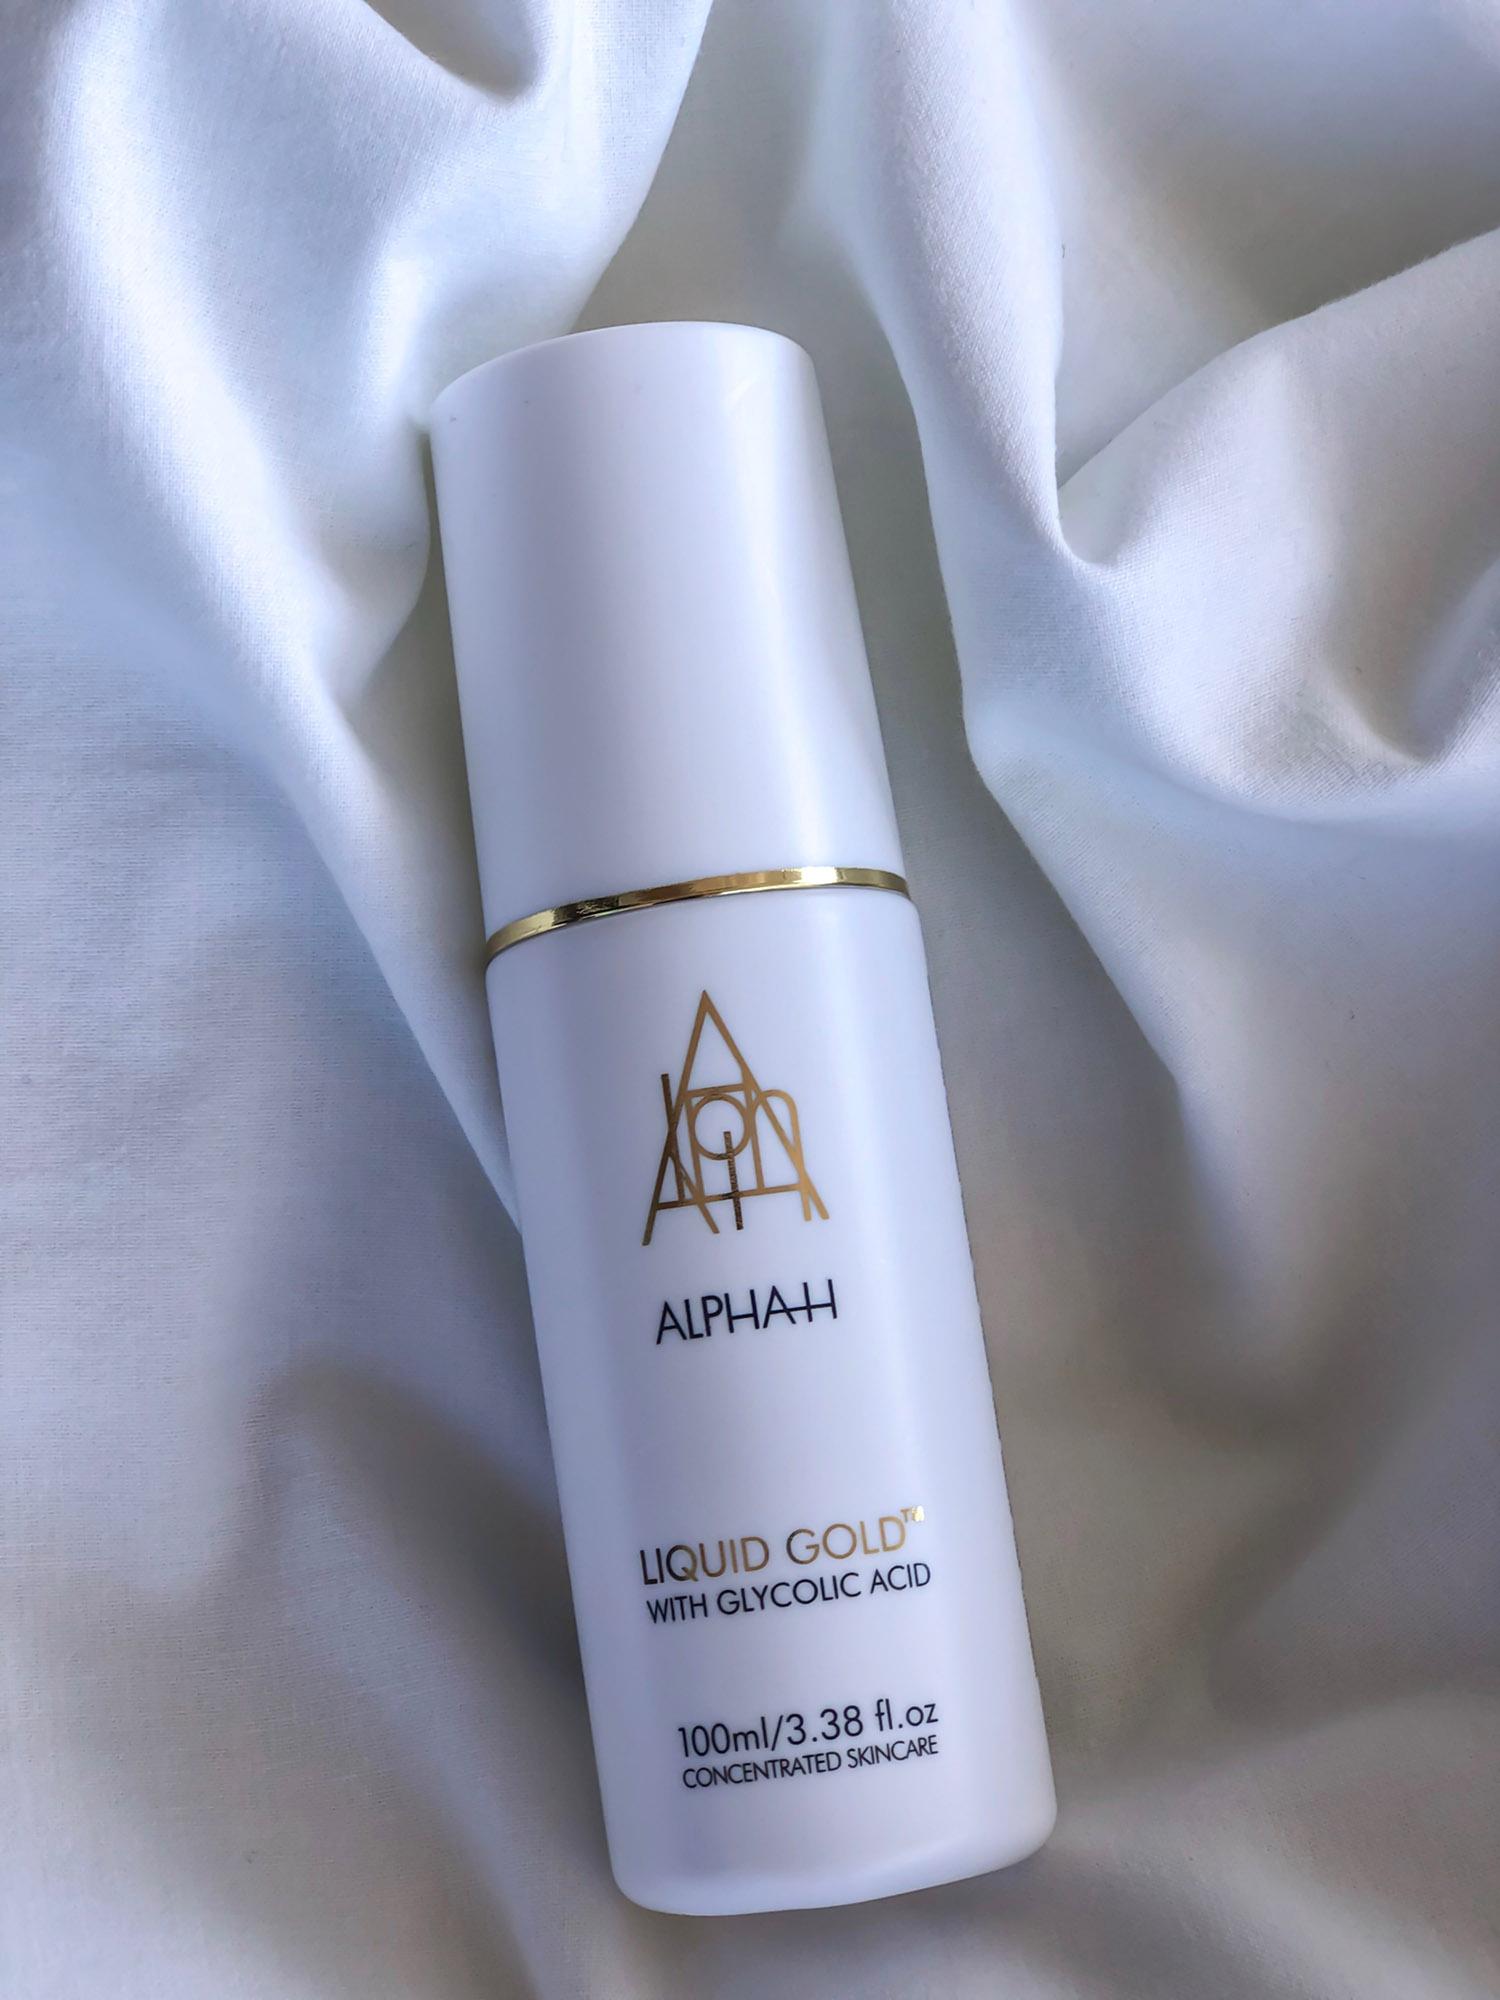 alphah-liquid-gold